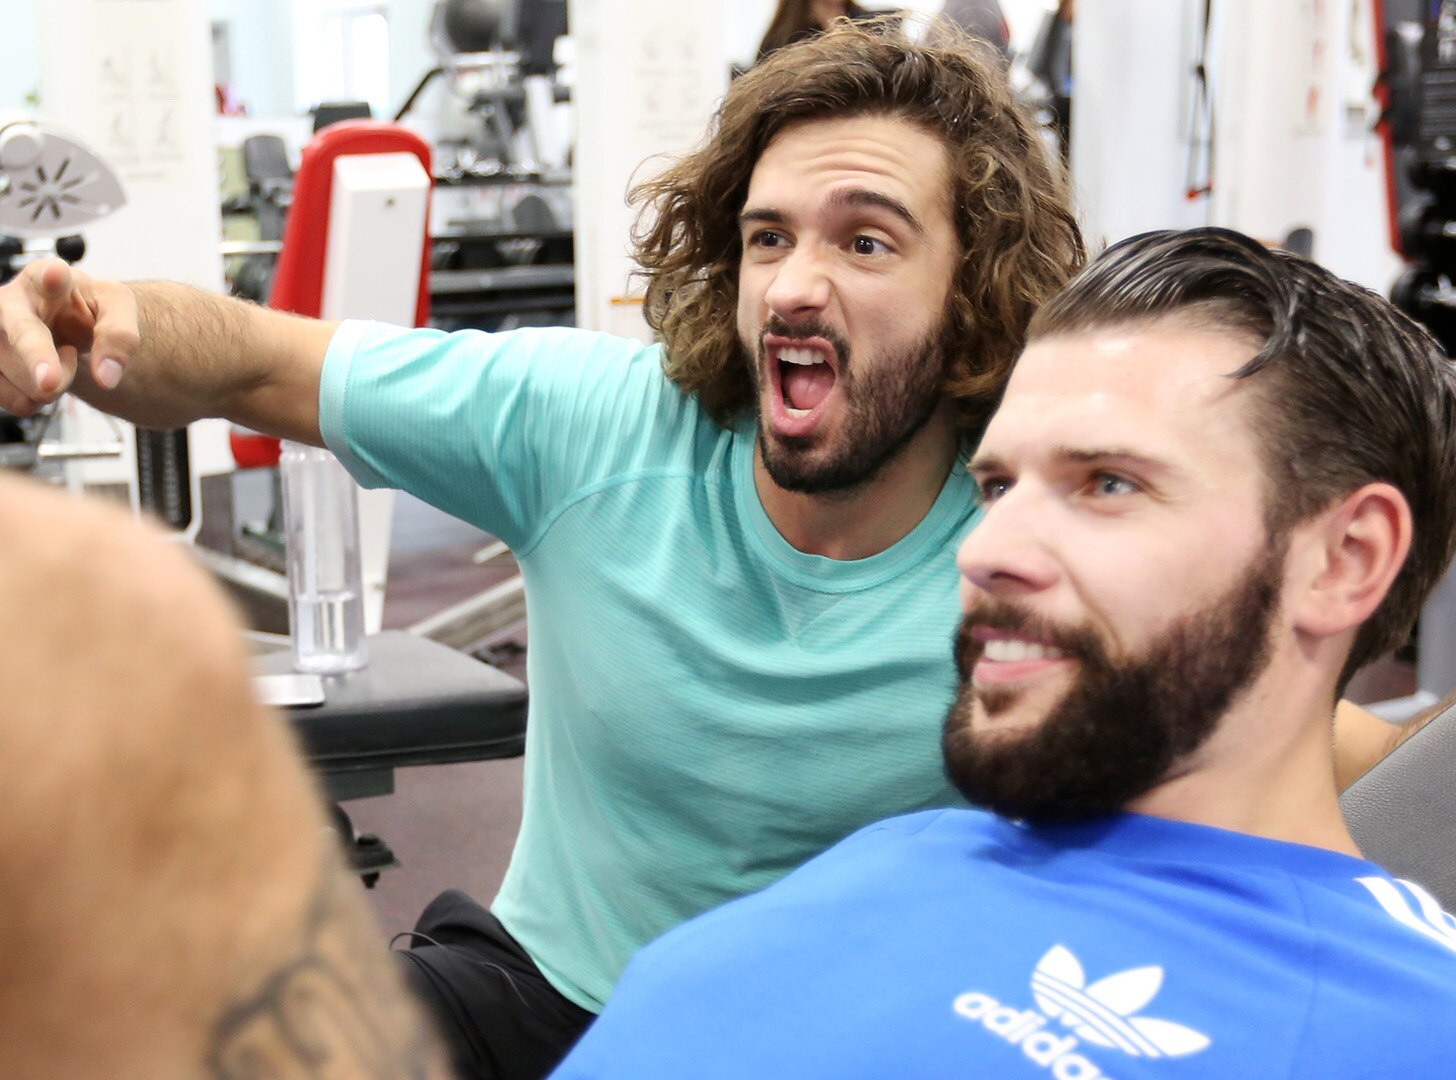 Joe Wicks: Celebrity Body Coach